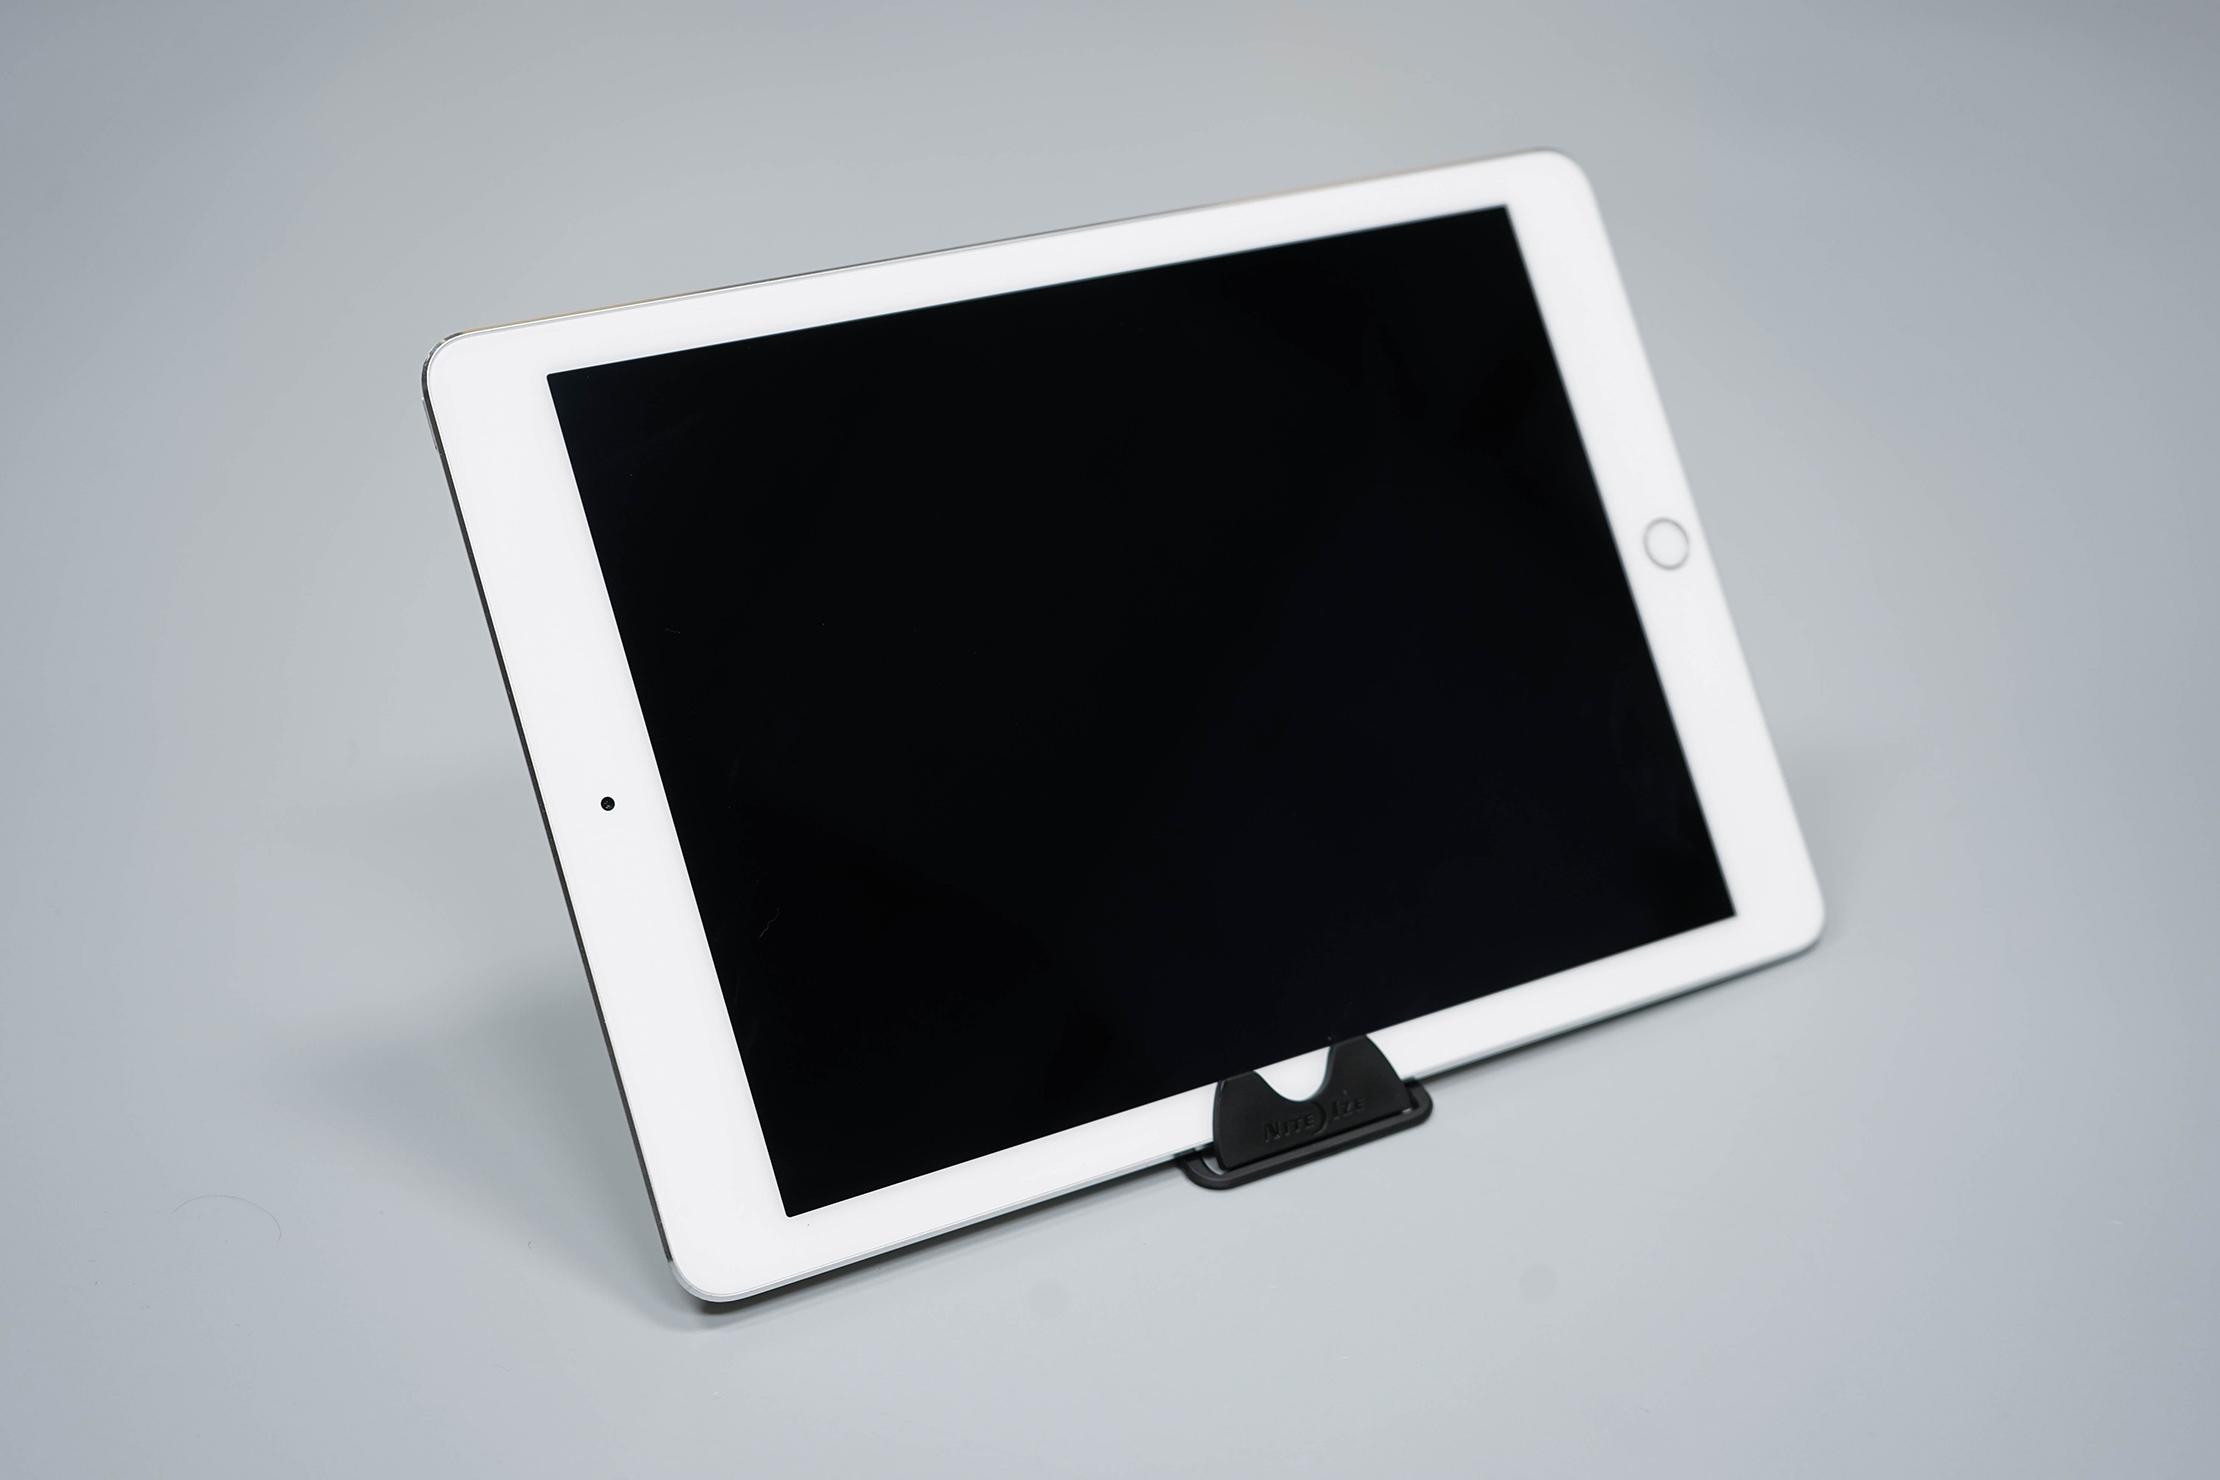 Nite Ize QuikStand Holding iPad